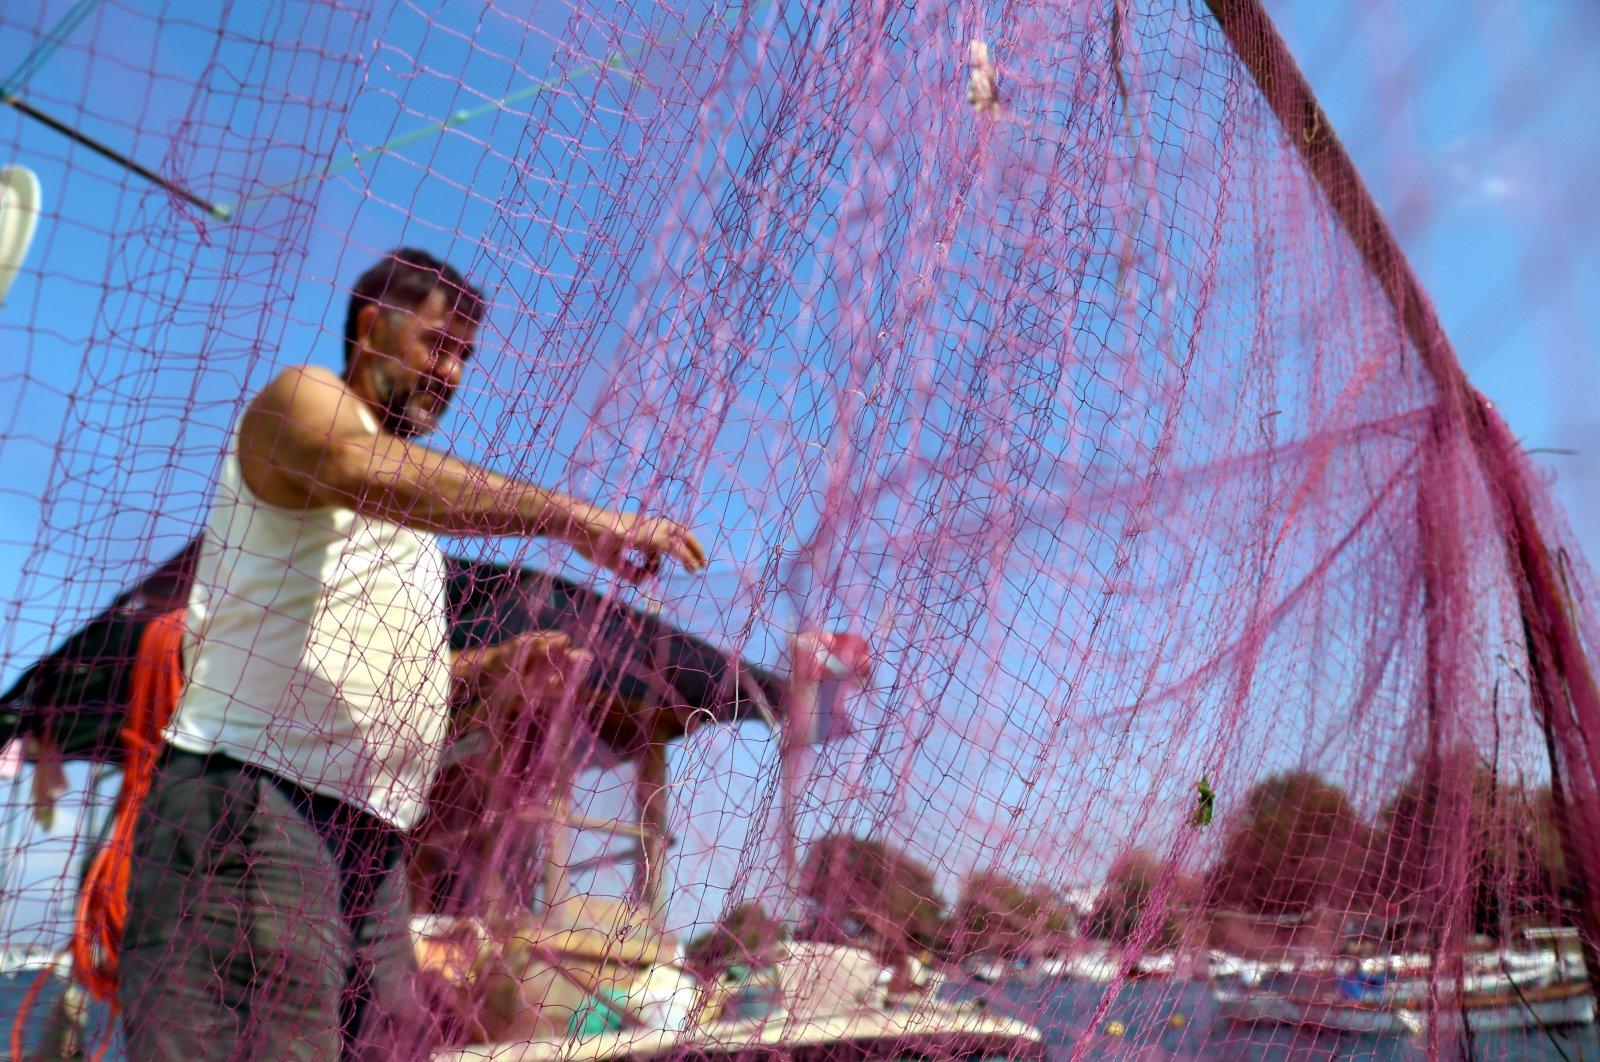 A fisherman examines a fishing net, in Yalova, northwestern Turkey, Aug. 26, 2021. (AA PHOTO)